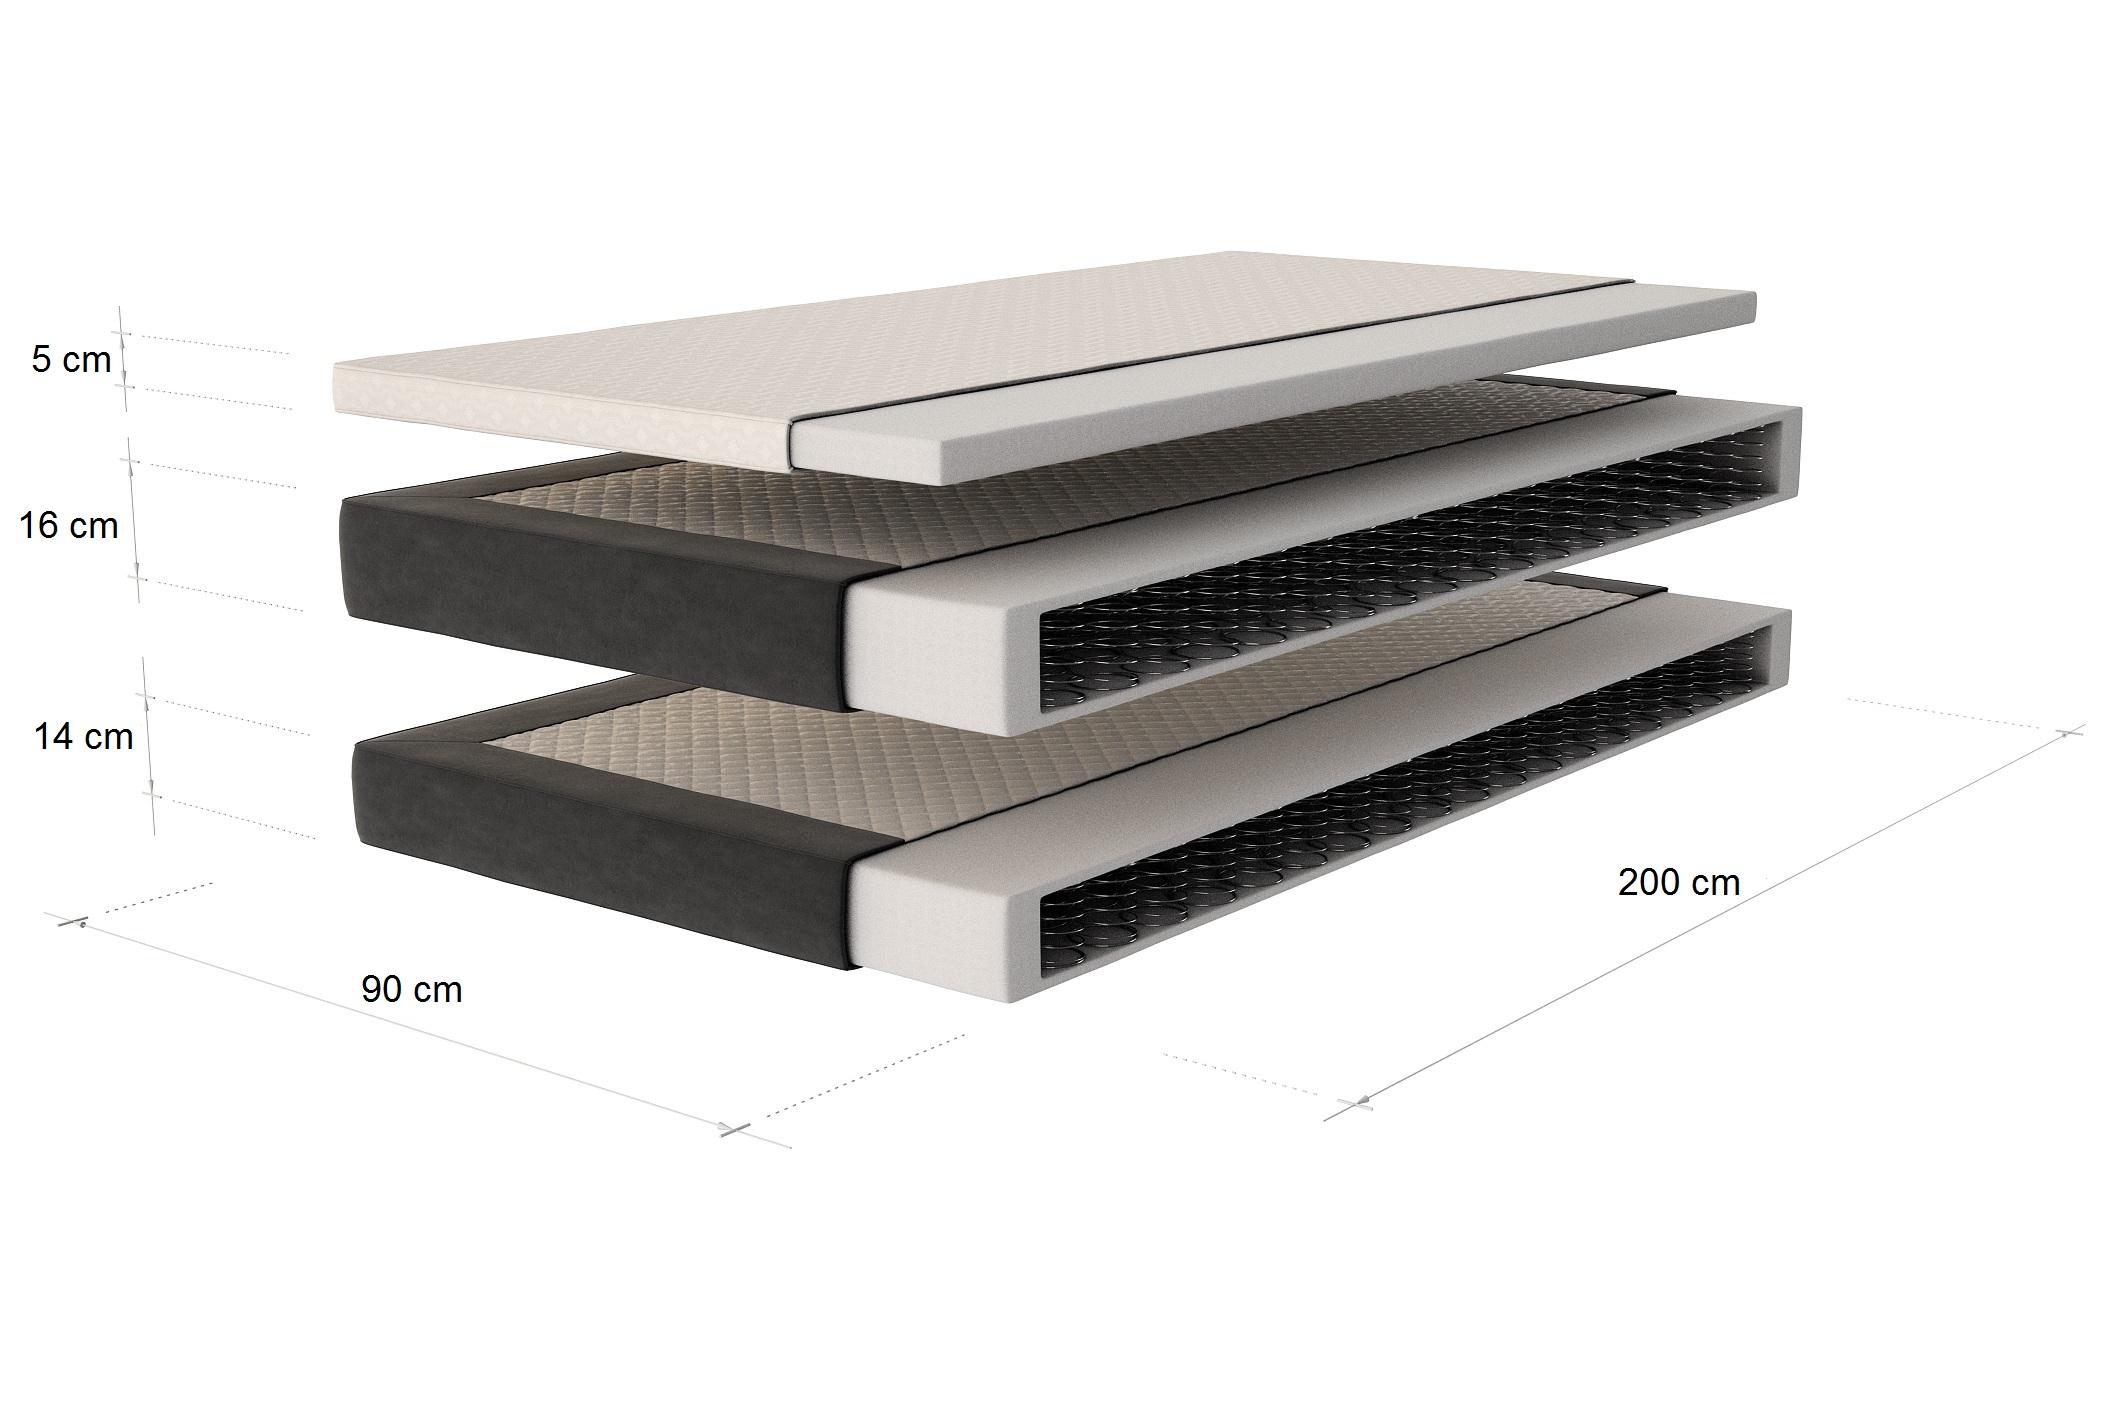 boxspring bett aquila design polsterbett designerbett. Black Bedroom Furniture Sets. Home Design Ideas